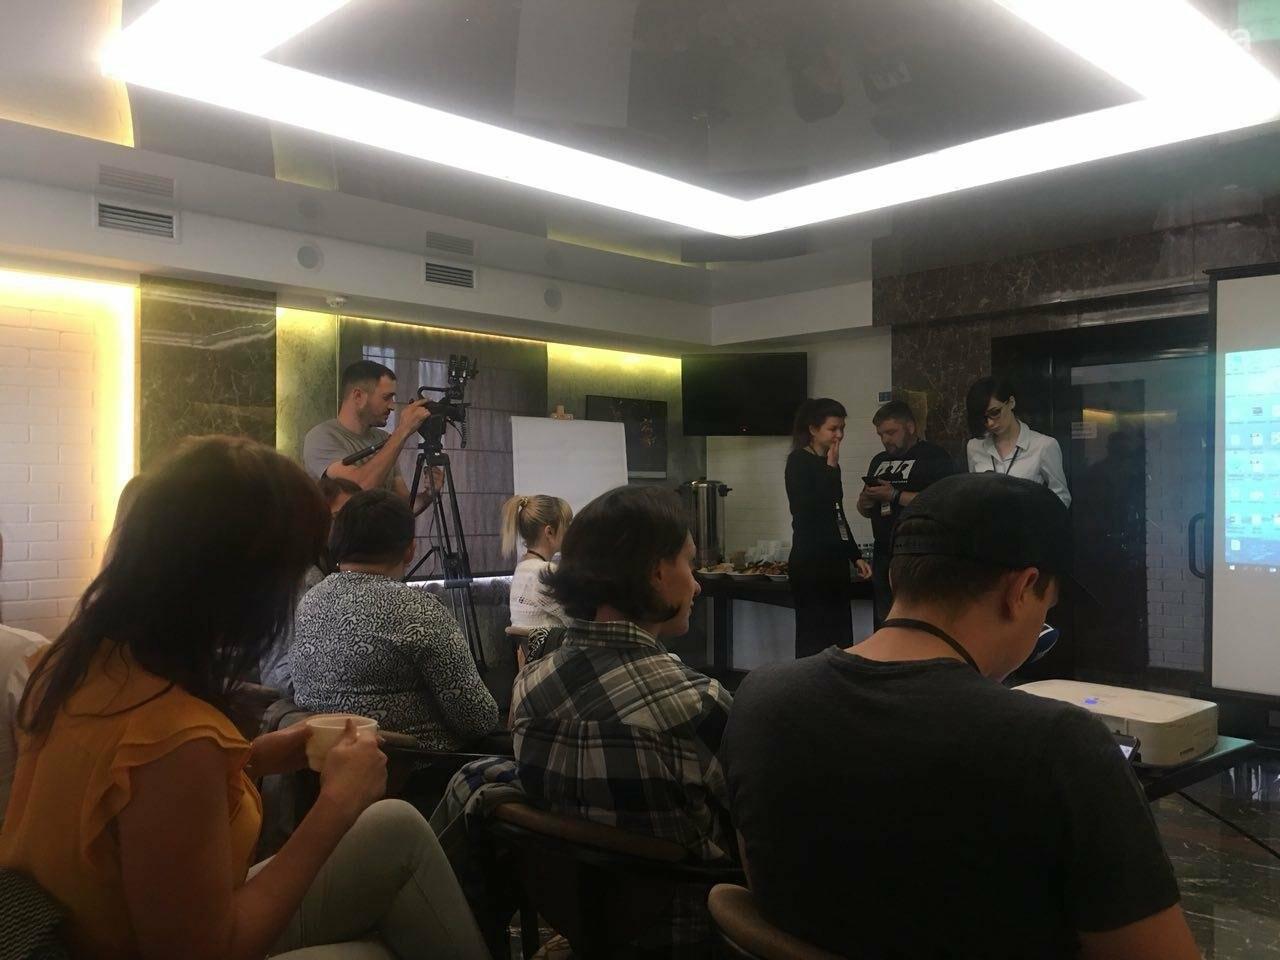 На тренинге о ВИЧ и медреформе криворожским журналистам рассказали о дискриминации и стереотипах, - ФОТО , фото-17